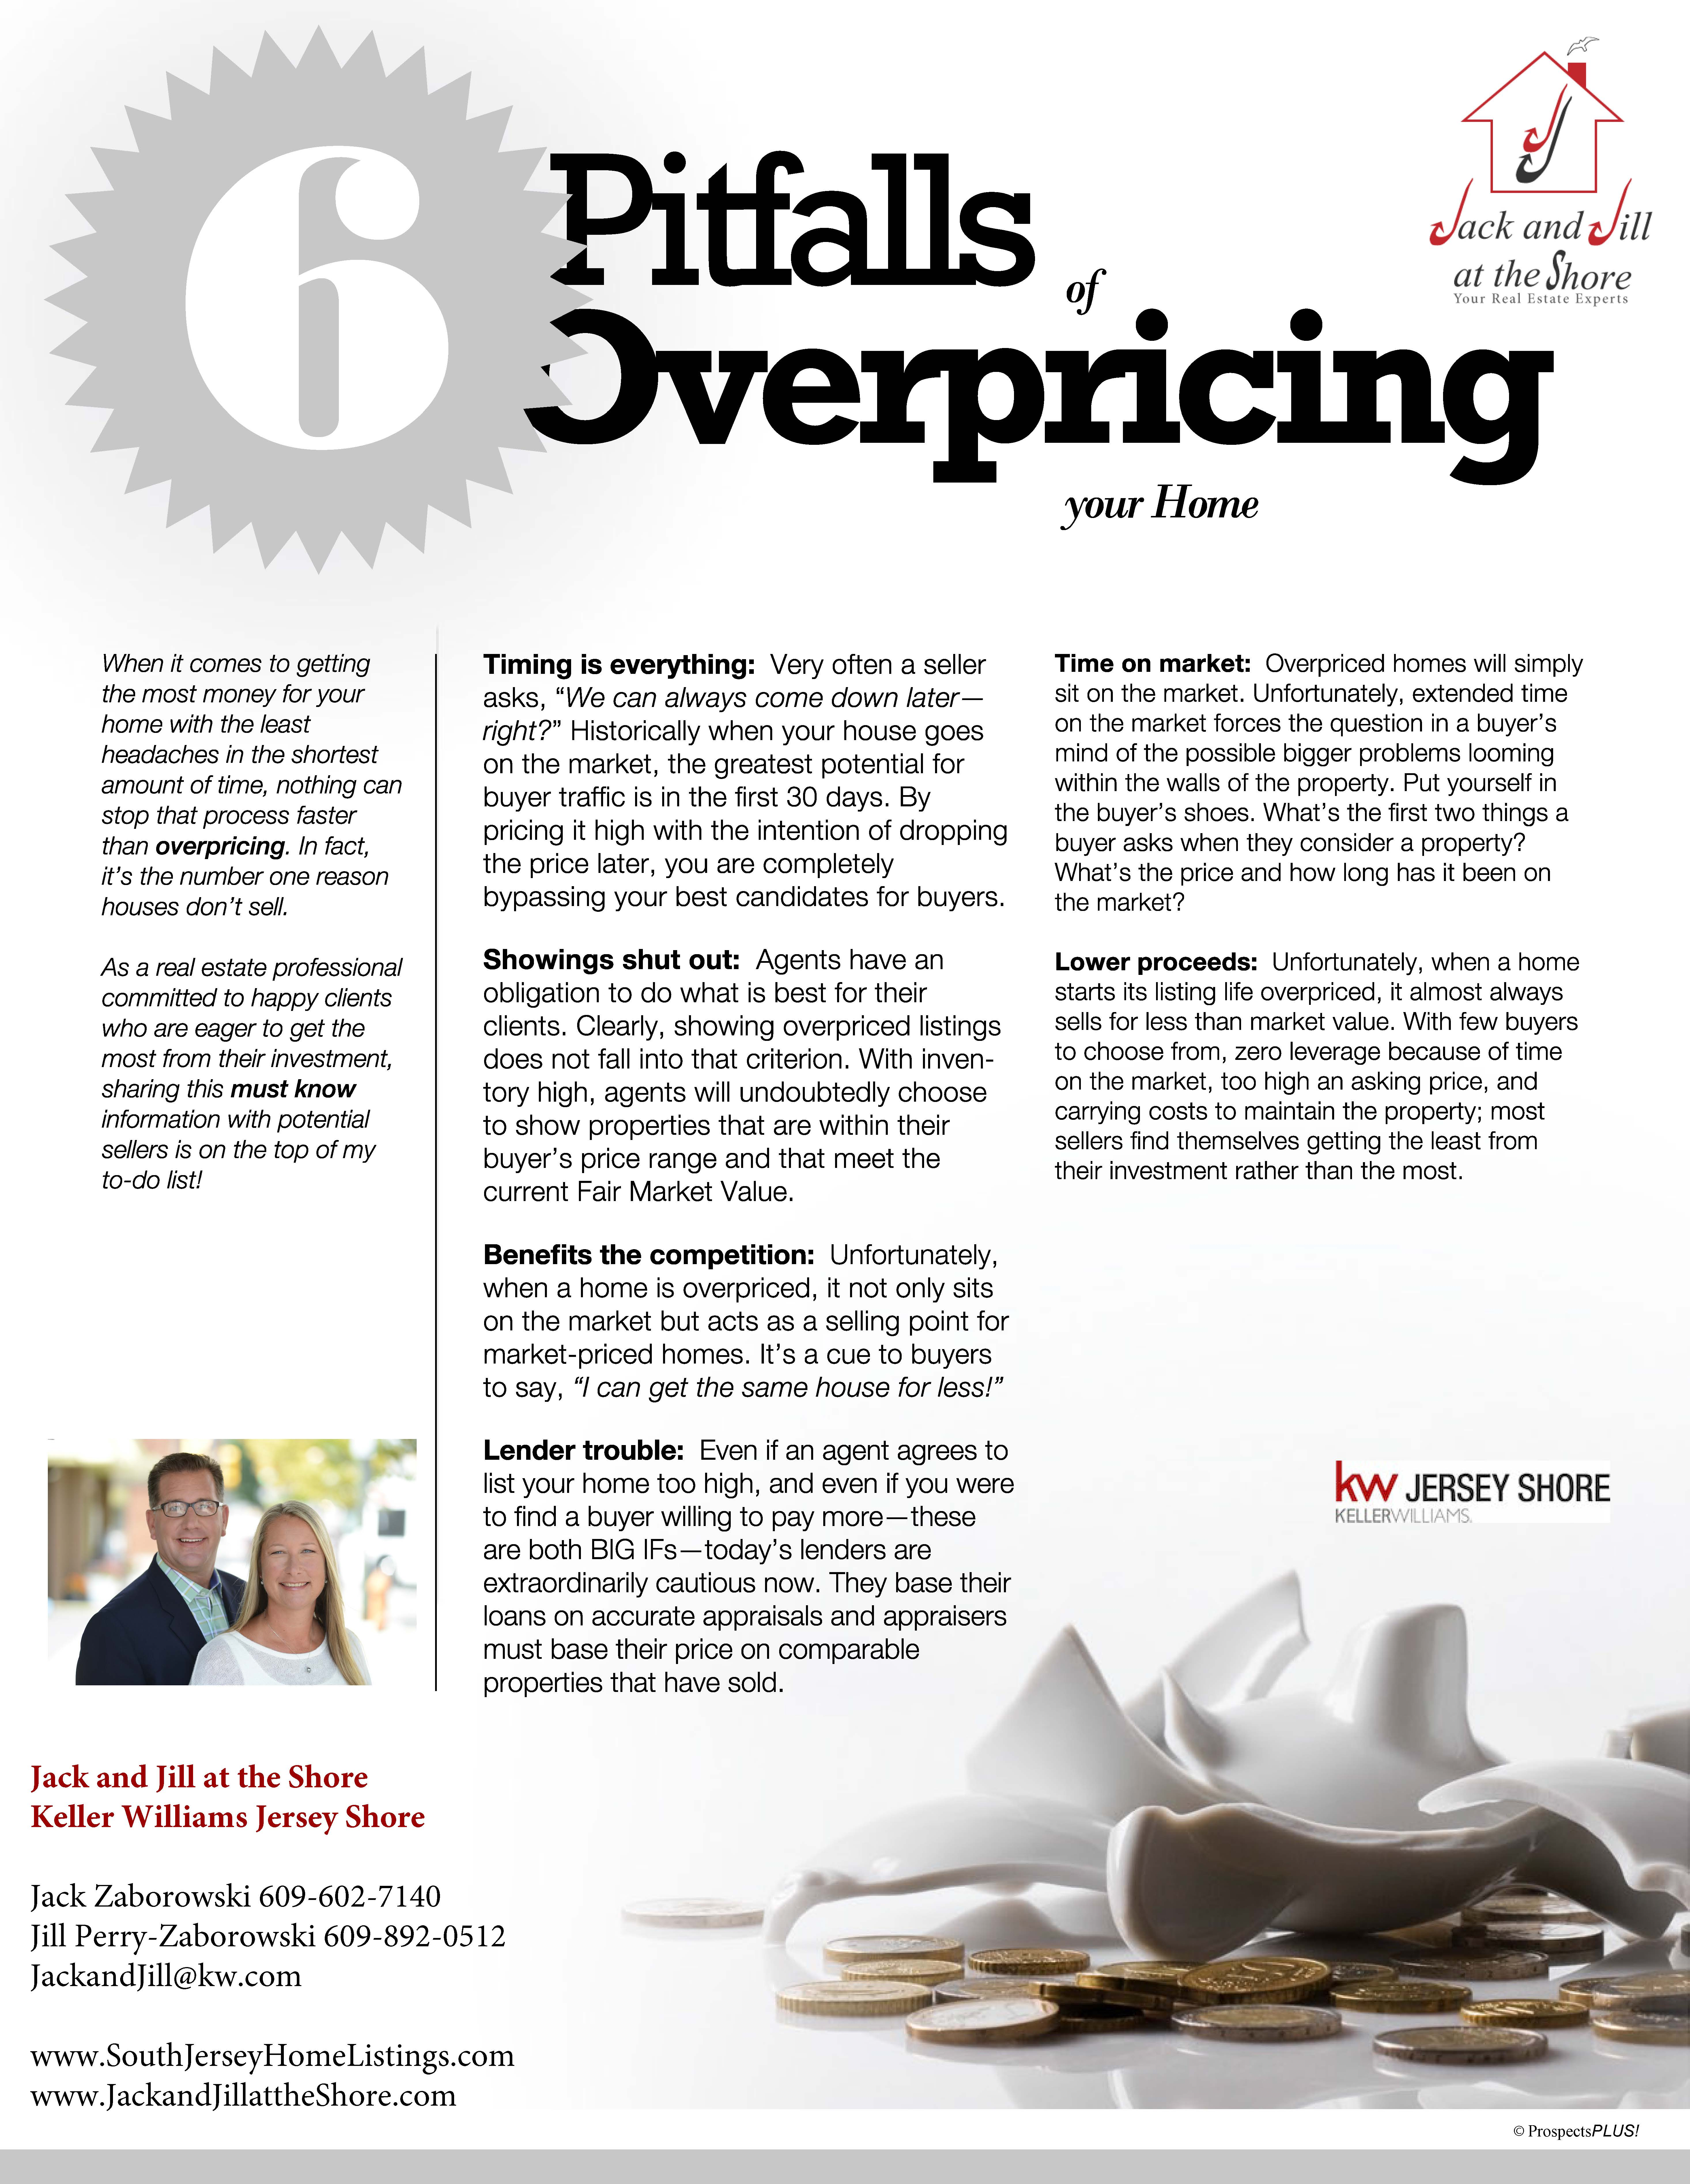 6_Pitfalls_Overpricing.jpg